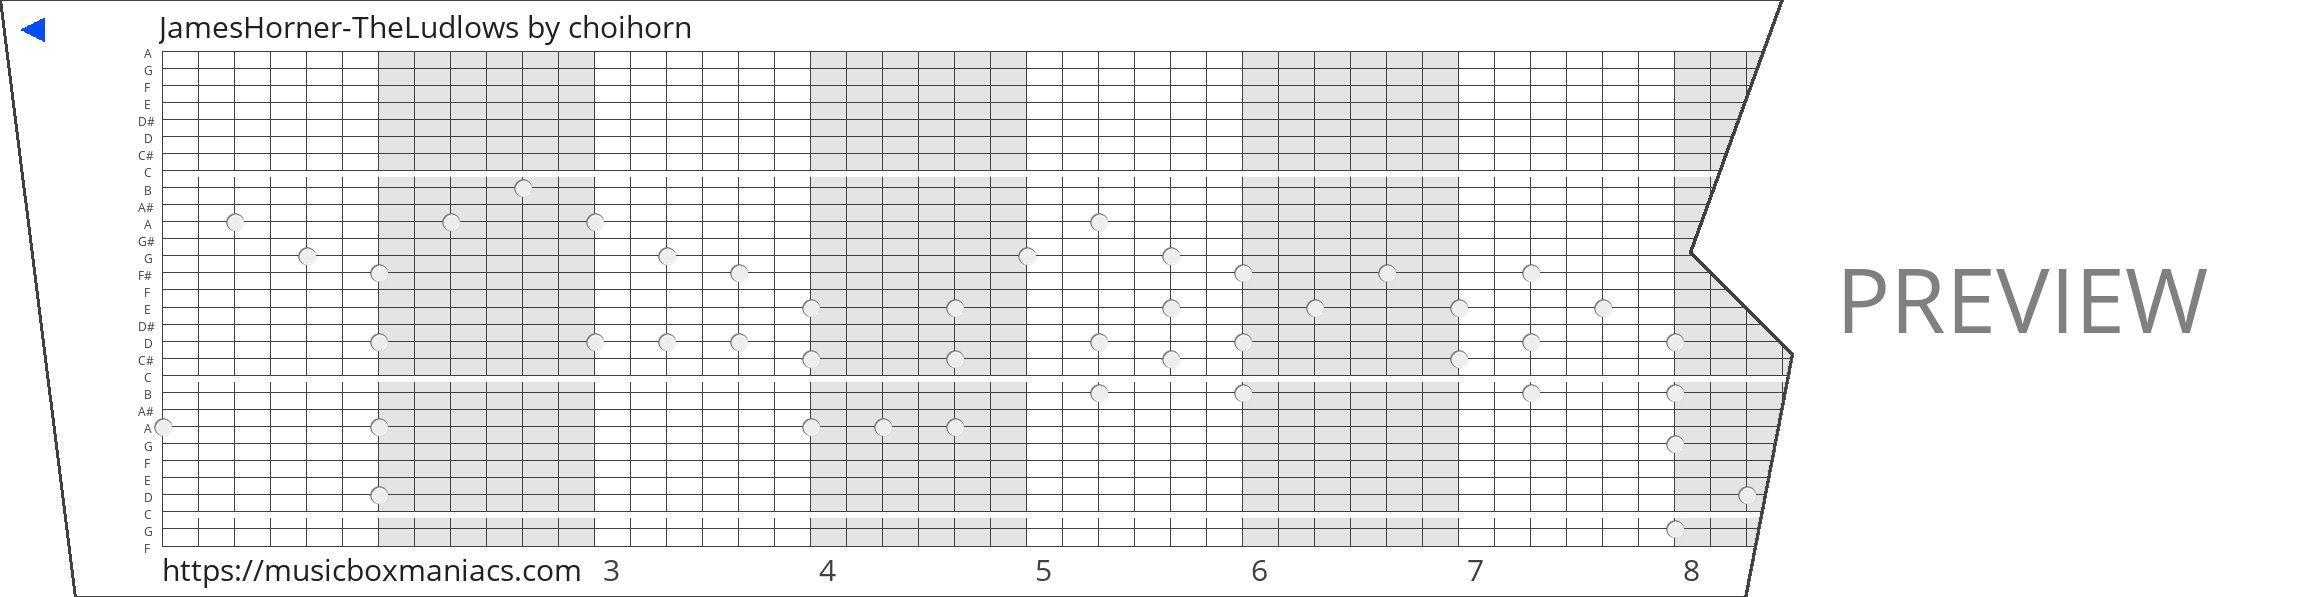 JamesHorner-TheLudlows 30 note music box paper strip